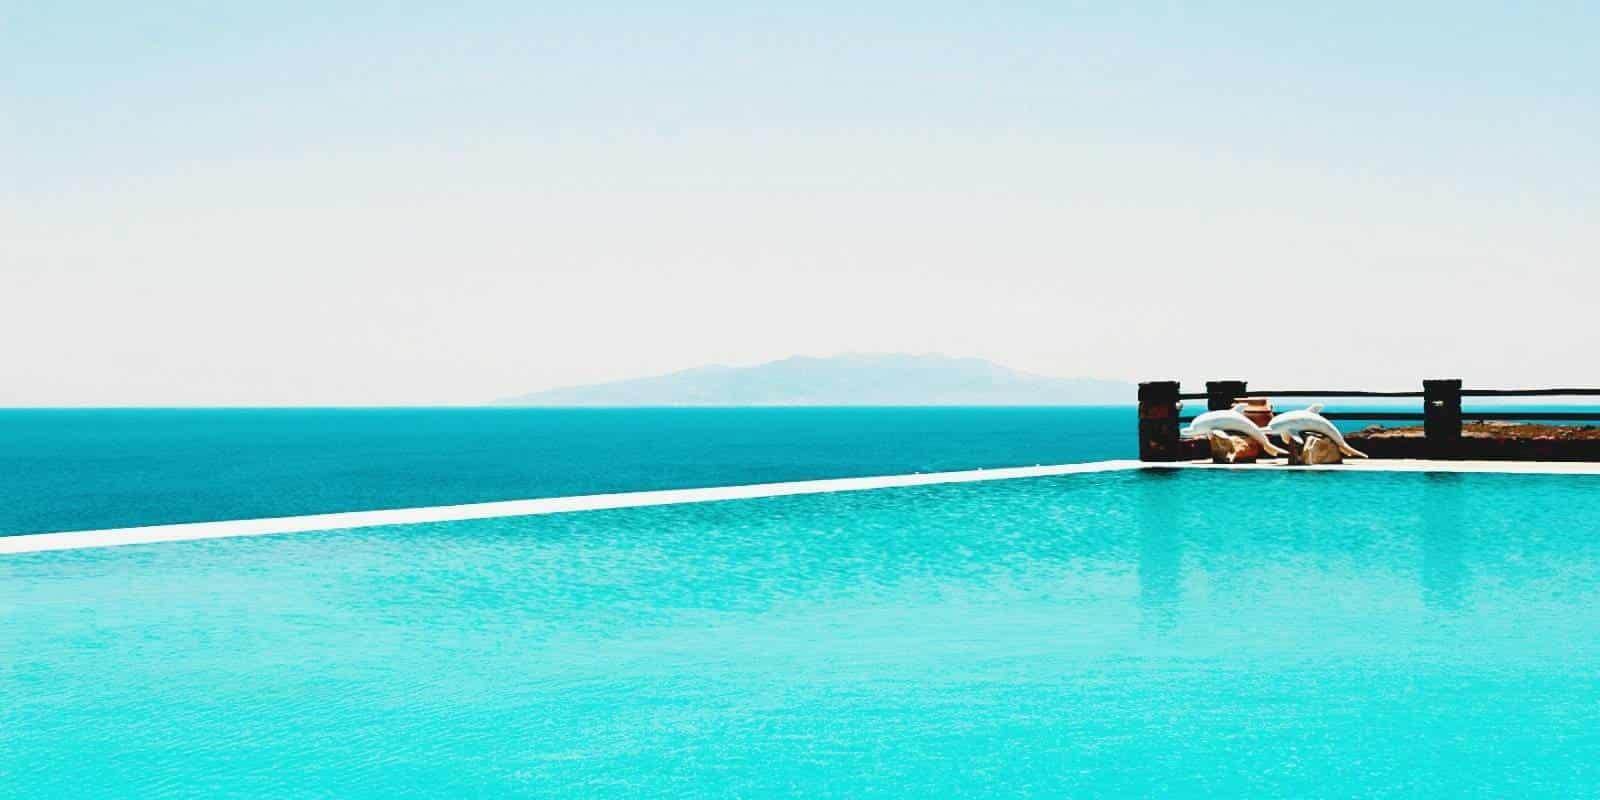 luxurious villa Mykonos - πολυτελής βίλα Μύκονος - mykonos services - οικοδομικές εργασίες 26